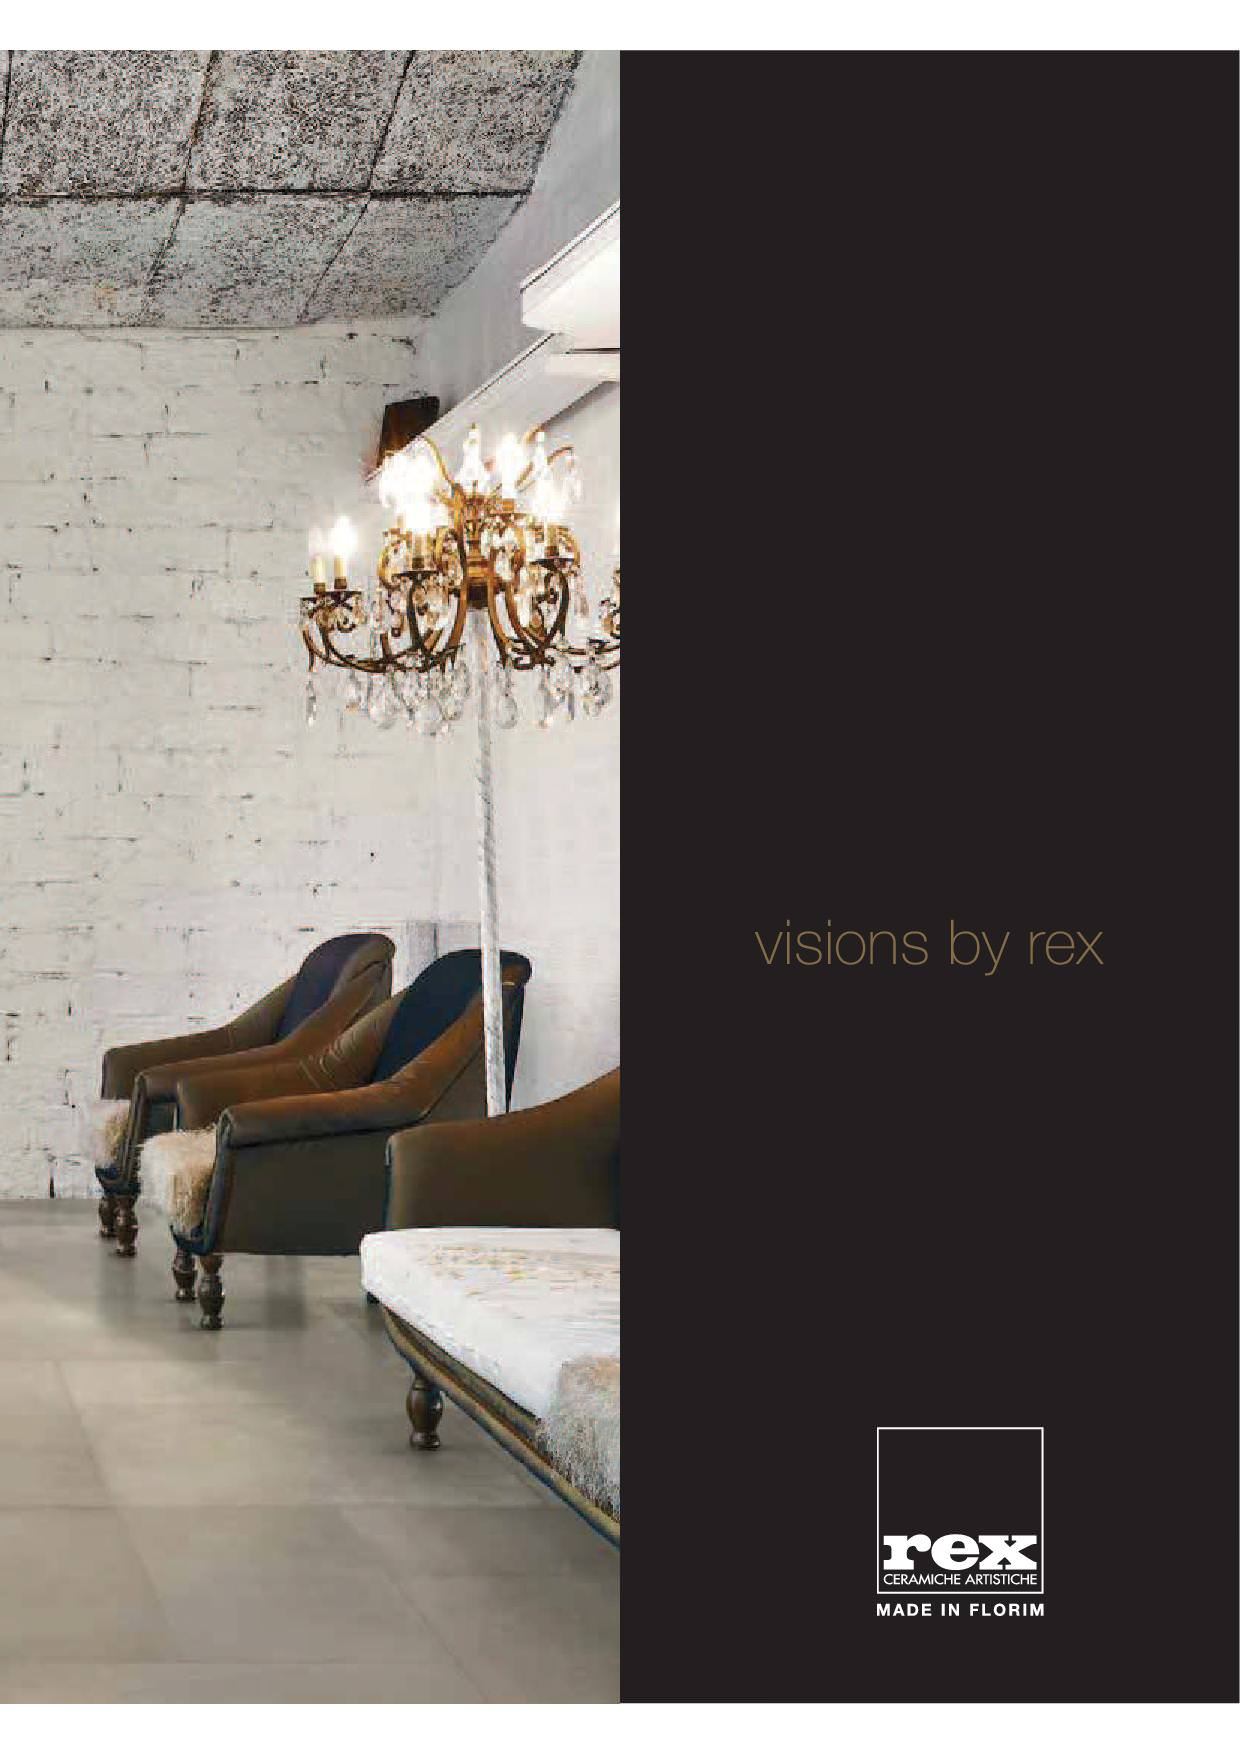 REX VISIONS BY REX